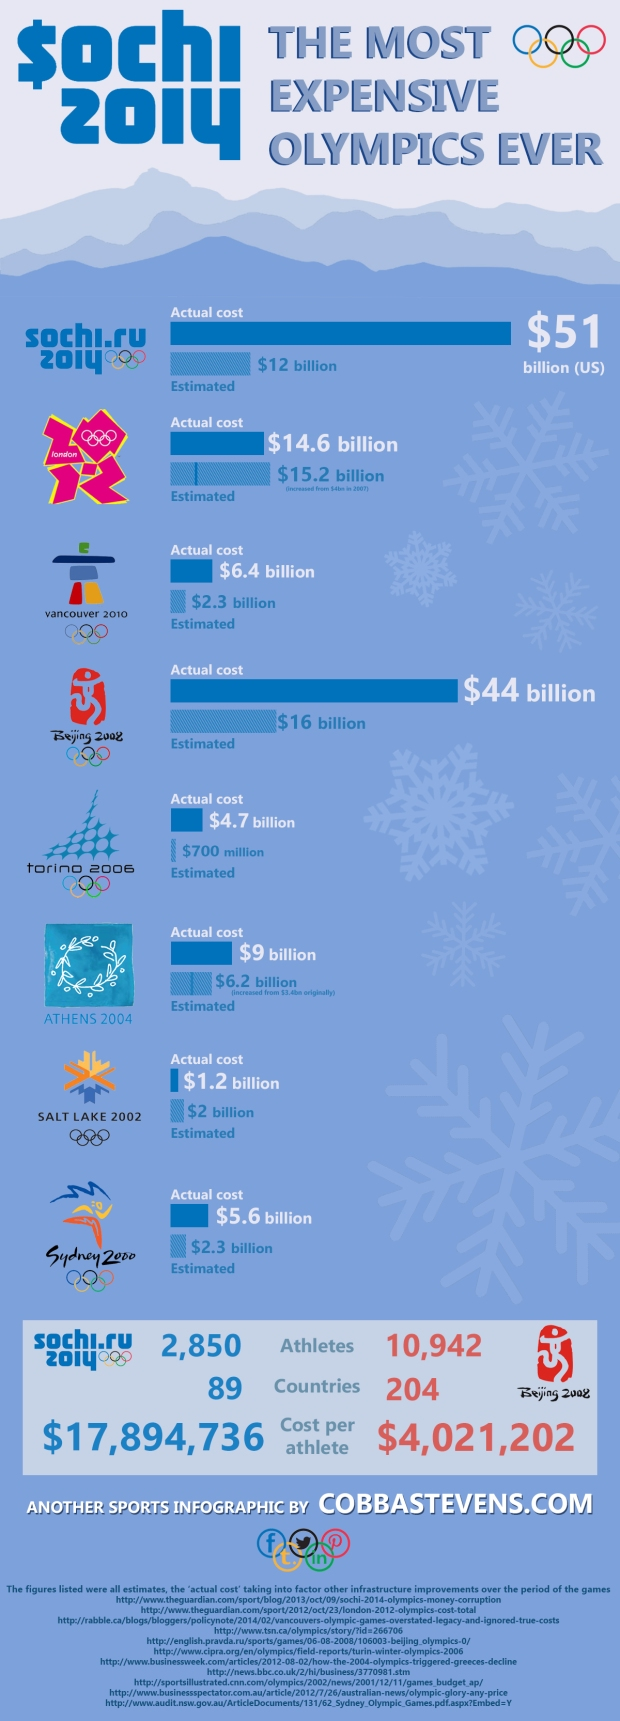 Cost of Sochi2